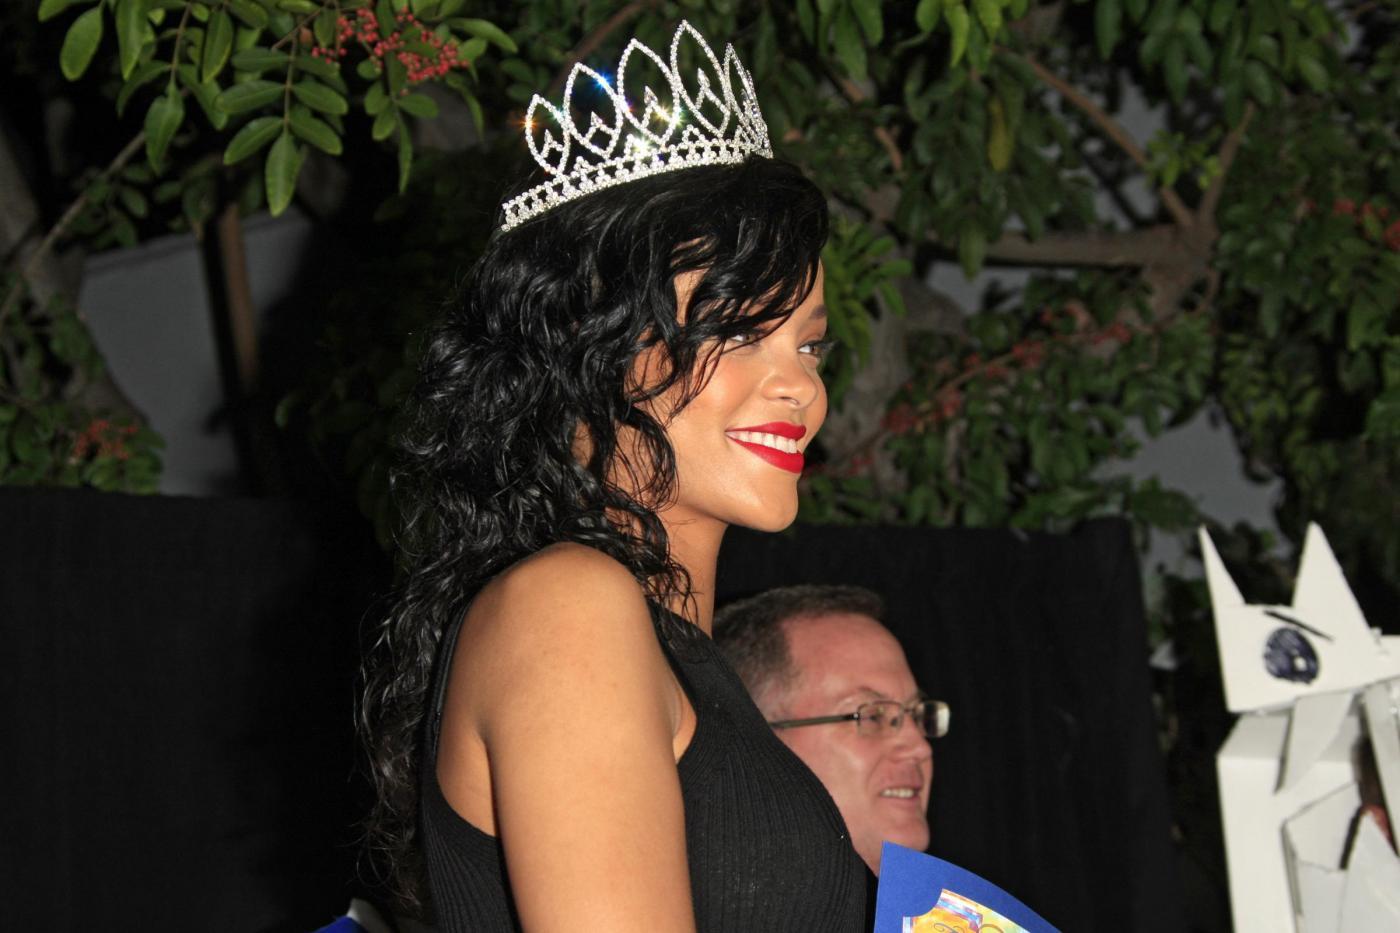 Rihanna incoronata regina di Halloween04